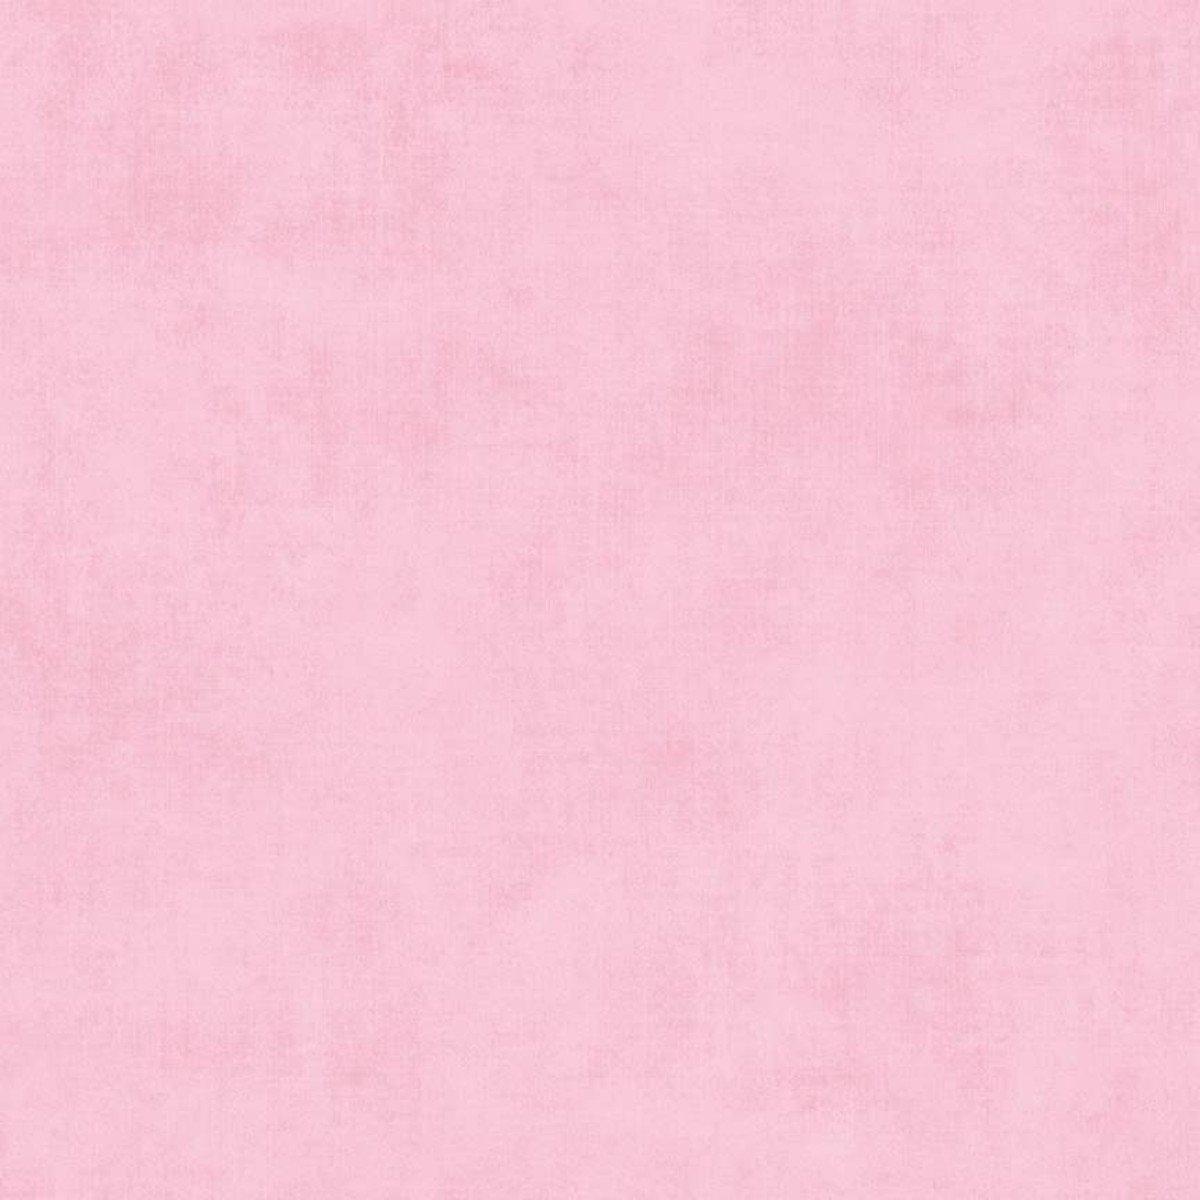 Fabric Riley Blake Flannel F200-80 Lt. Pink